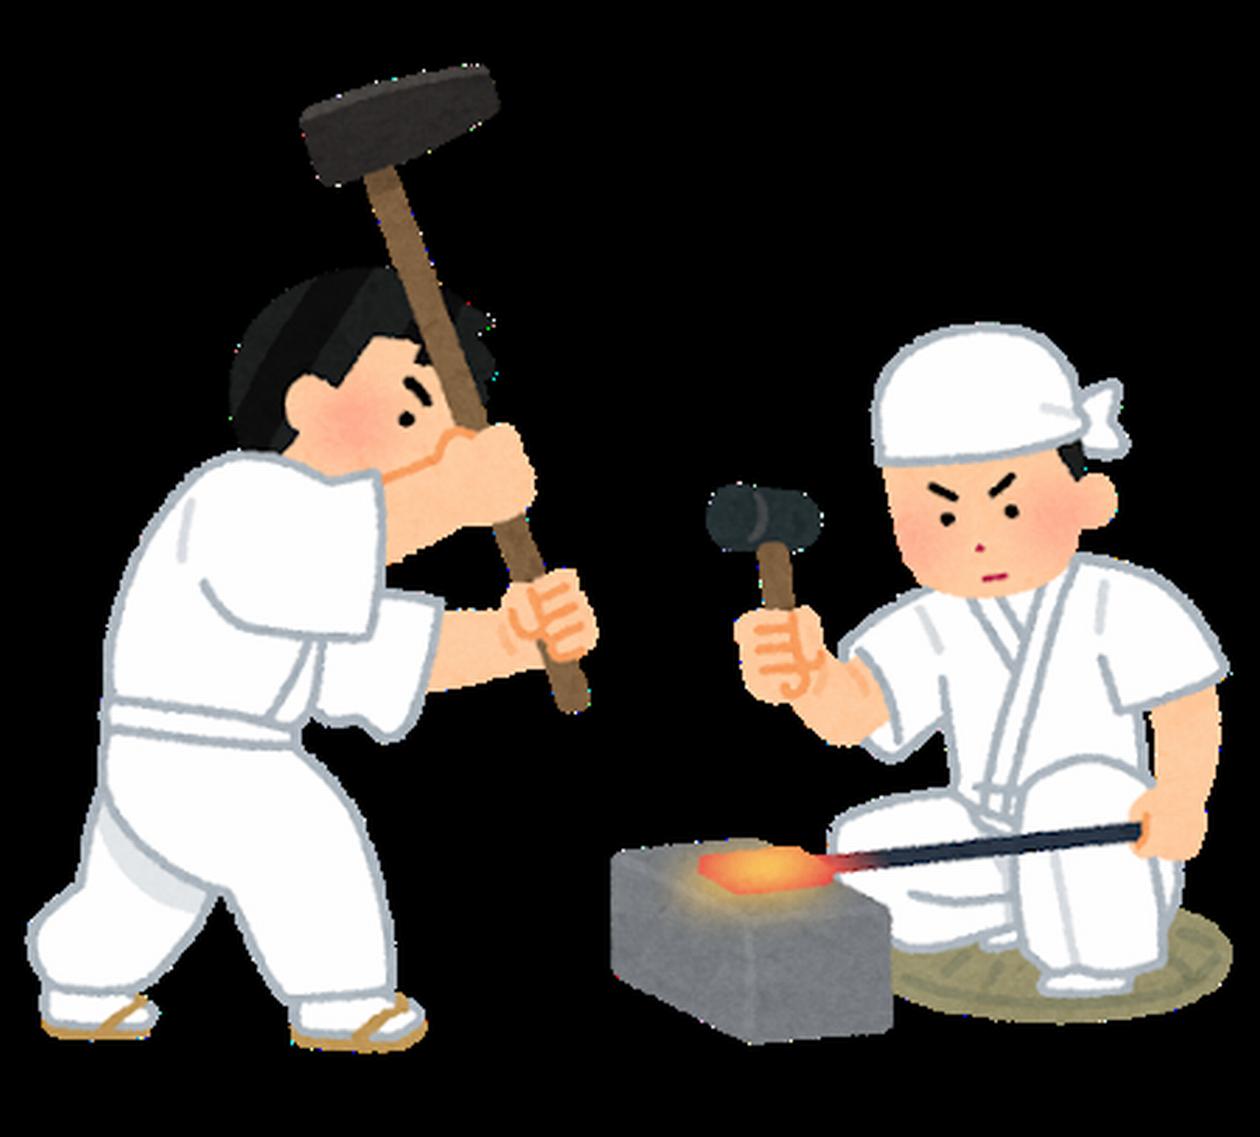 job nihontou katanakaji aiduchi - 鬼滅の刃 日輪刀一覧【刃の色や名前・呼吸法との相関図・作り方】など